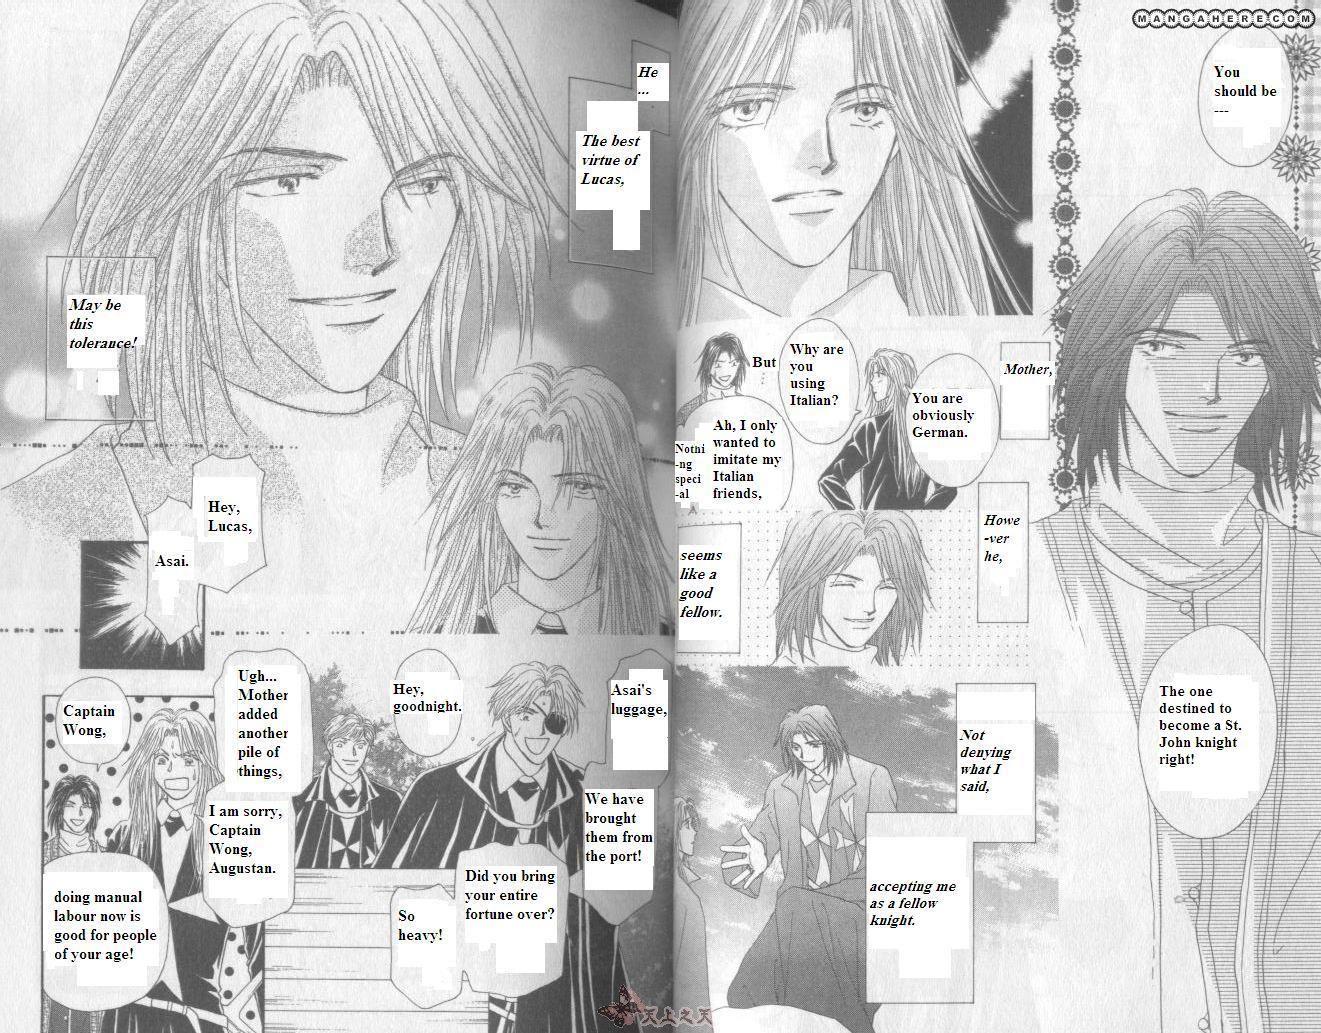 Umi No Kishidan 2 Page 5